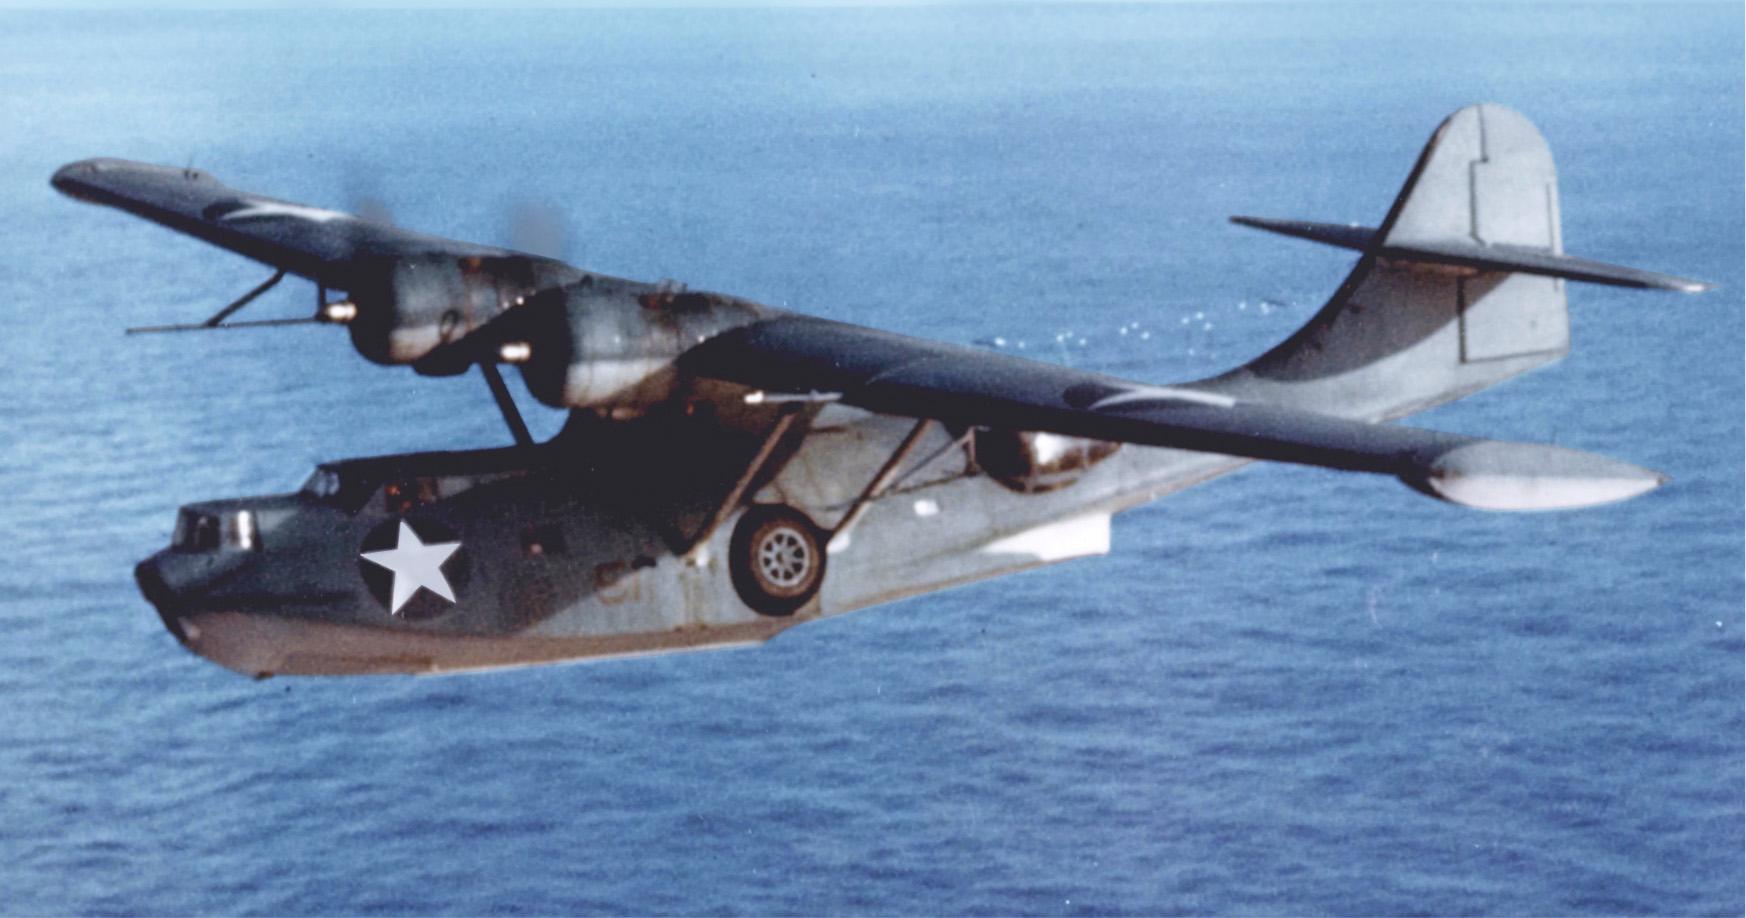 Consolidated PBY Catalina - Wikipedia